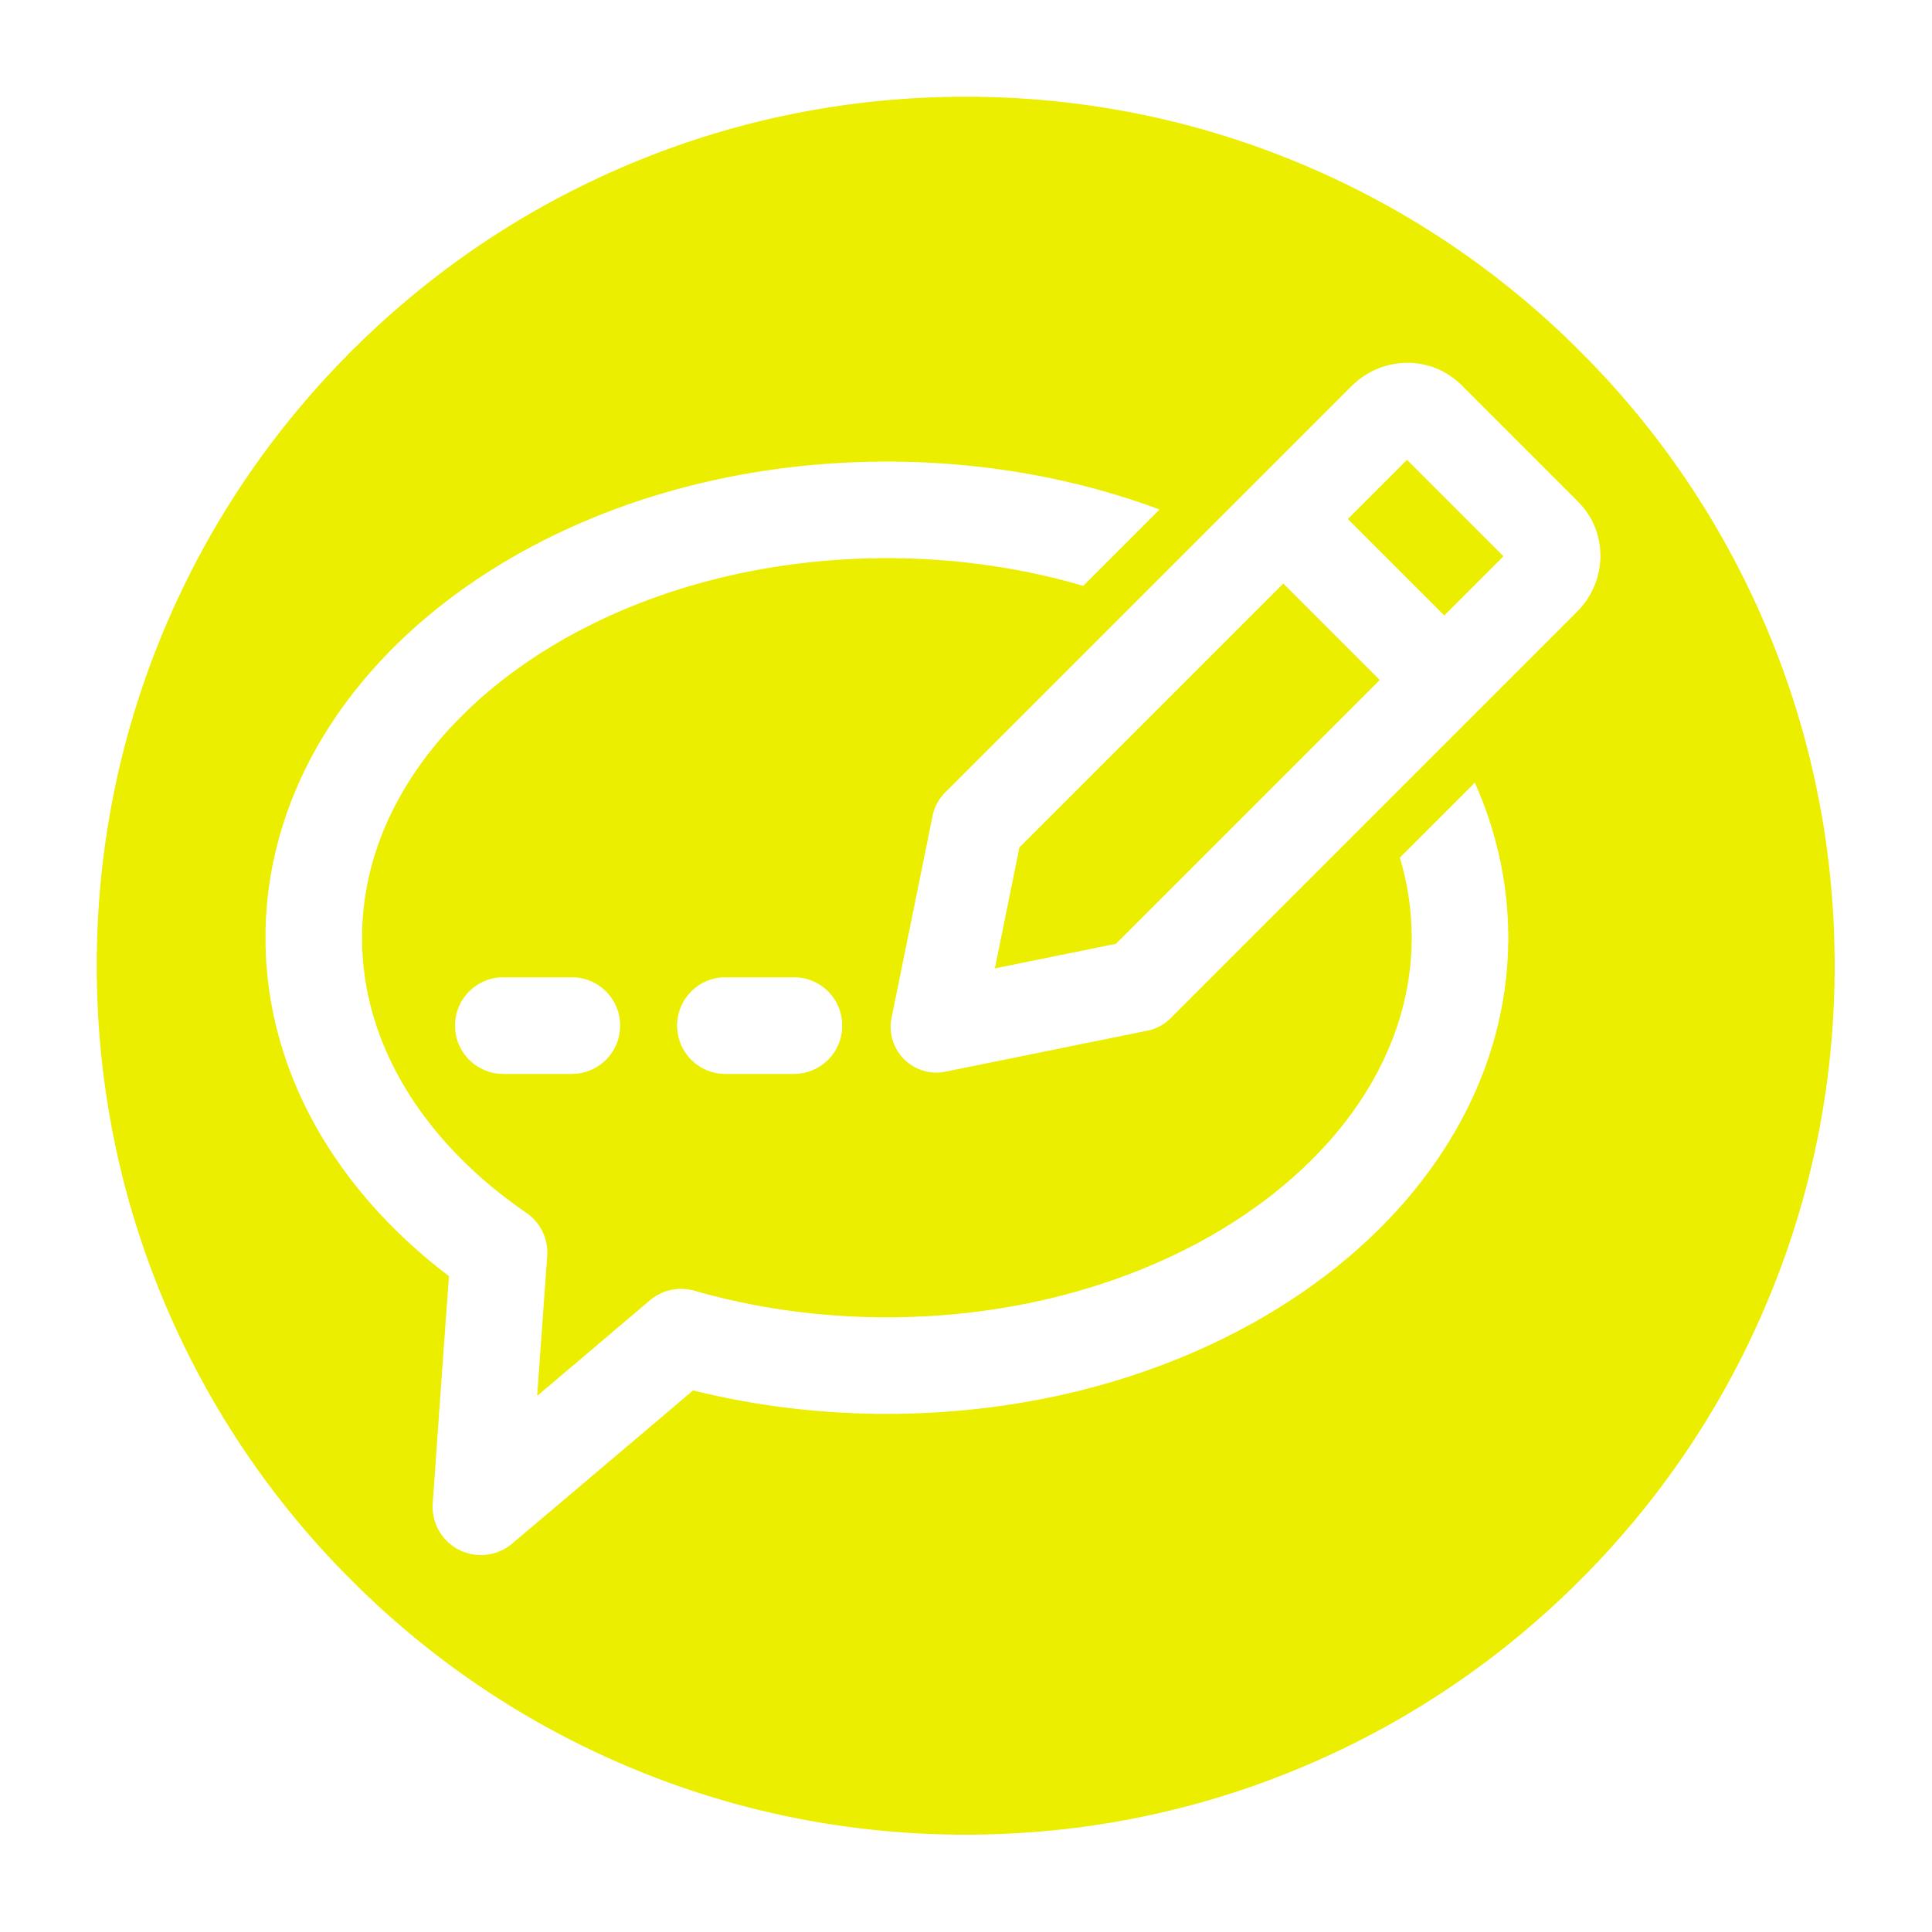 icona MicroBlog yellow